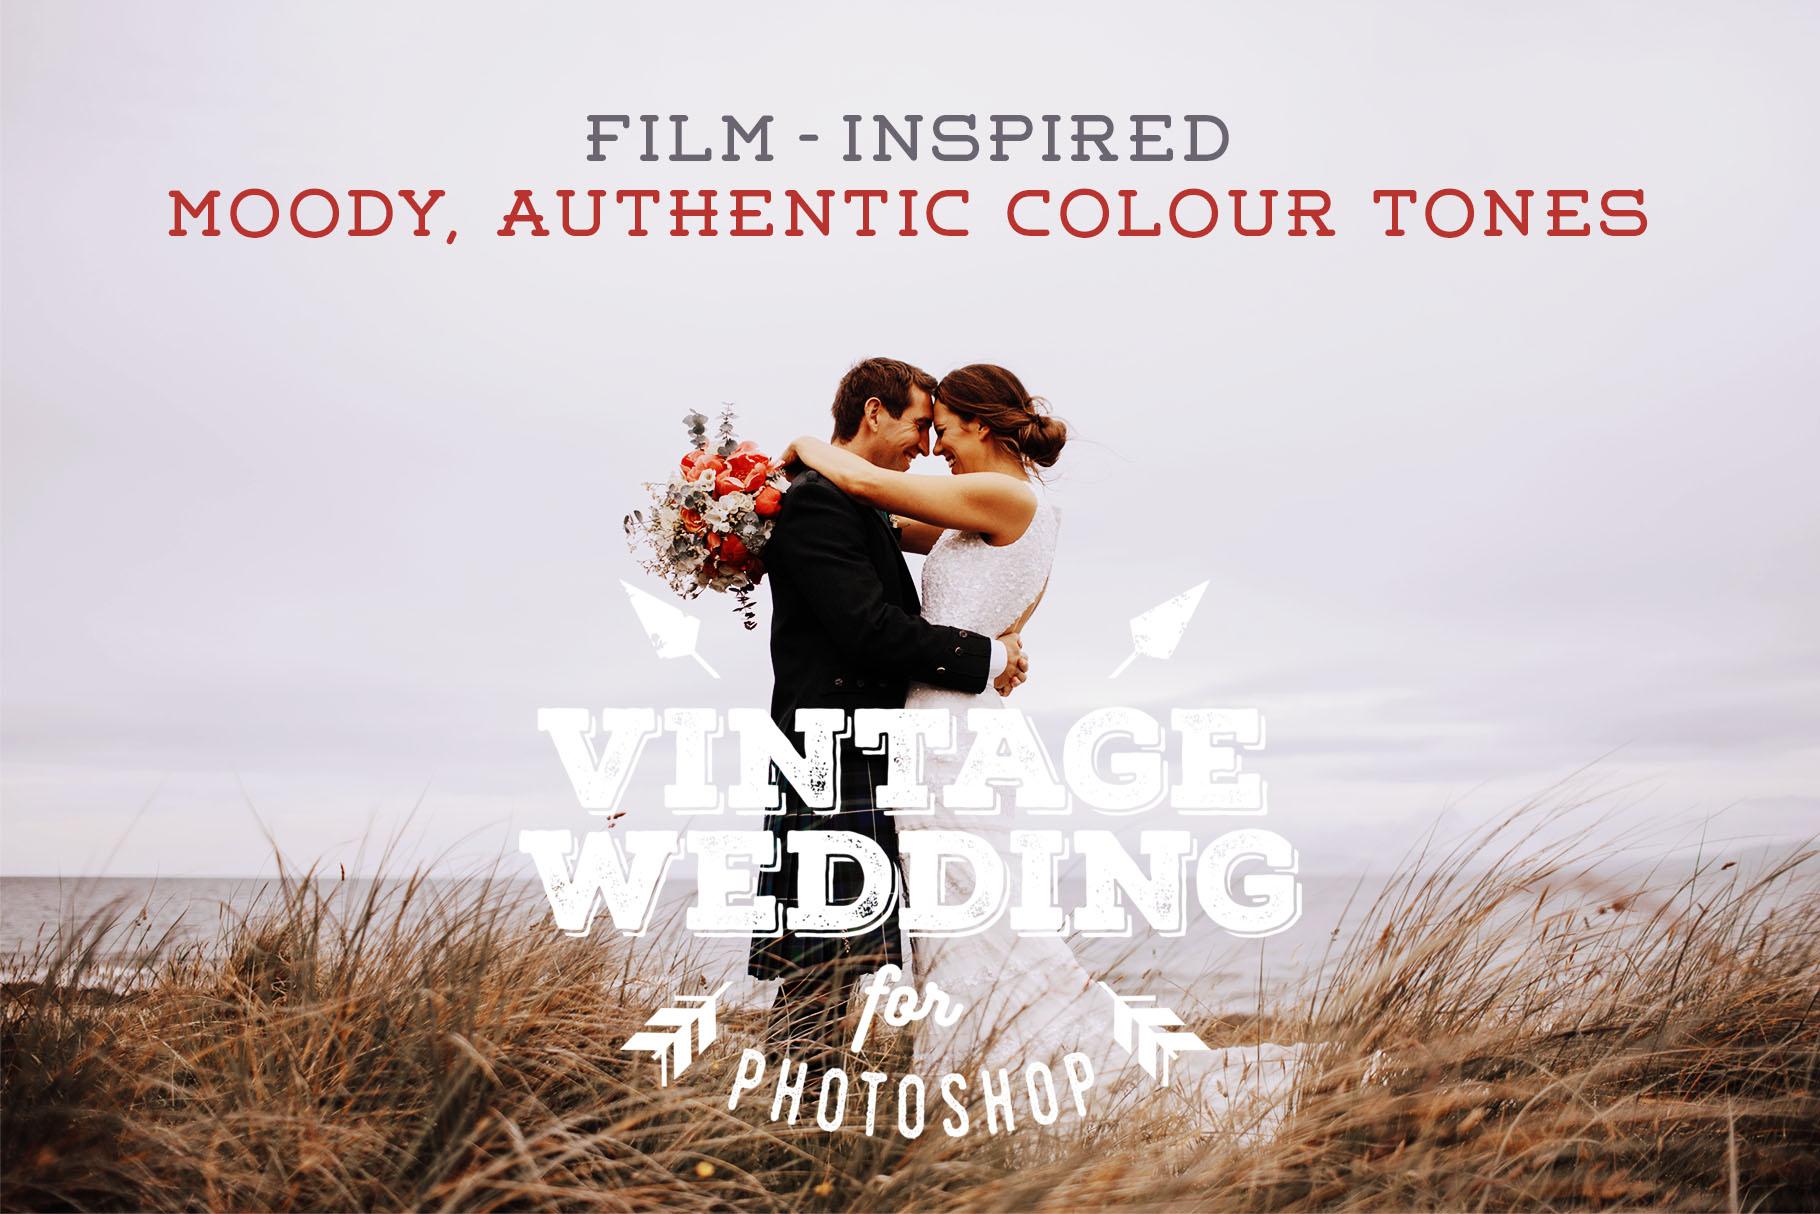 Vintage Wedding Photoshop Action by Pres